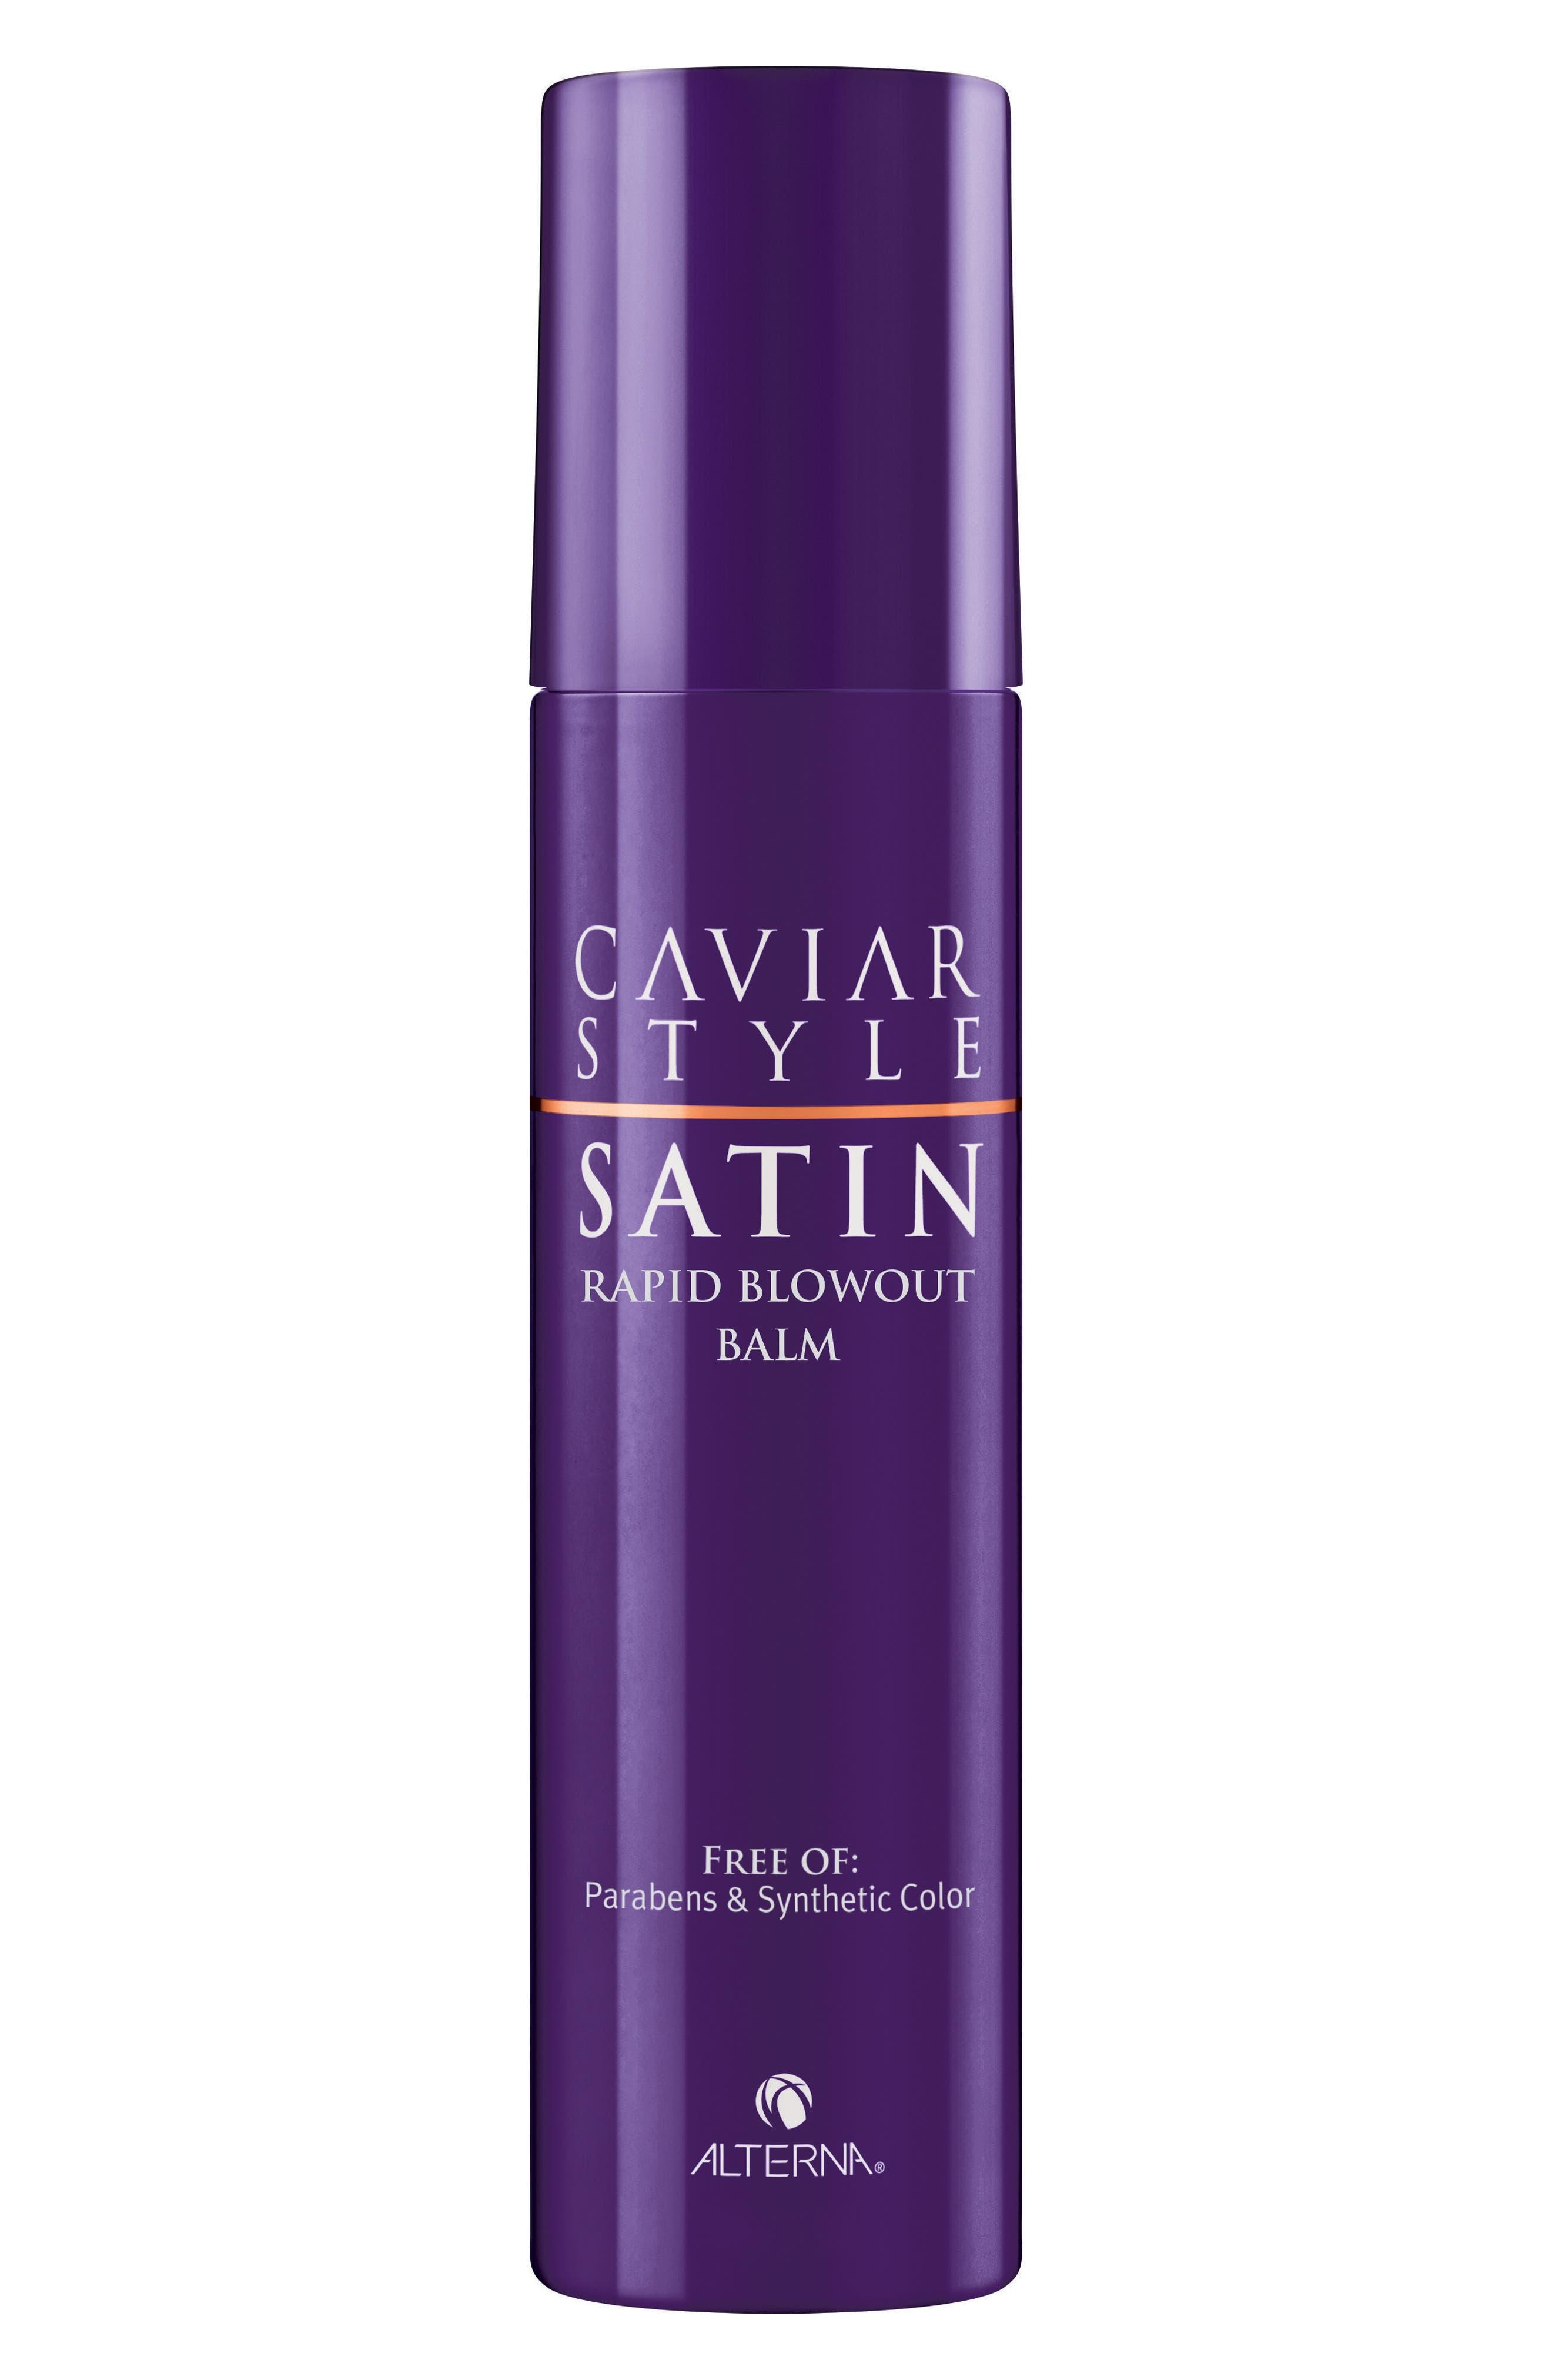 ALTERNA® Caviar Style Satin Rapid Blowout Balm